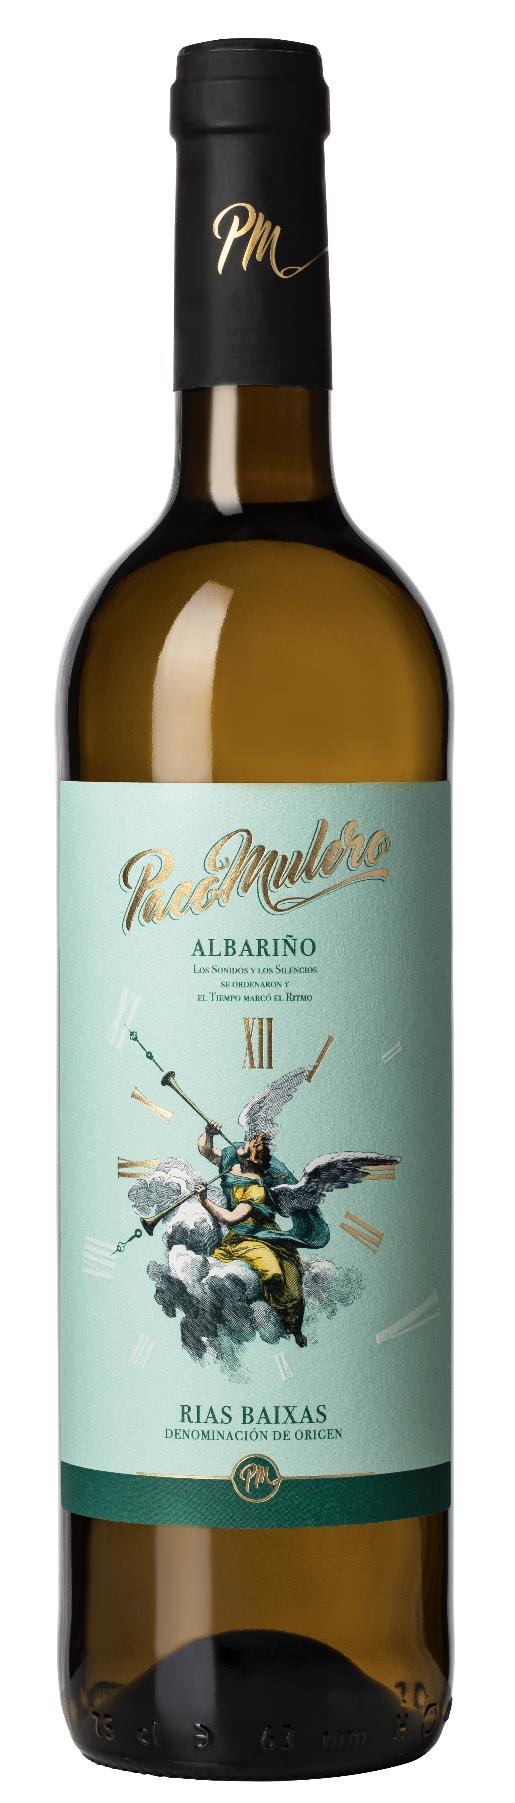 Albariño | Paco Mulero - Winexfood